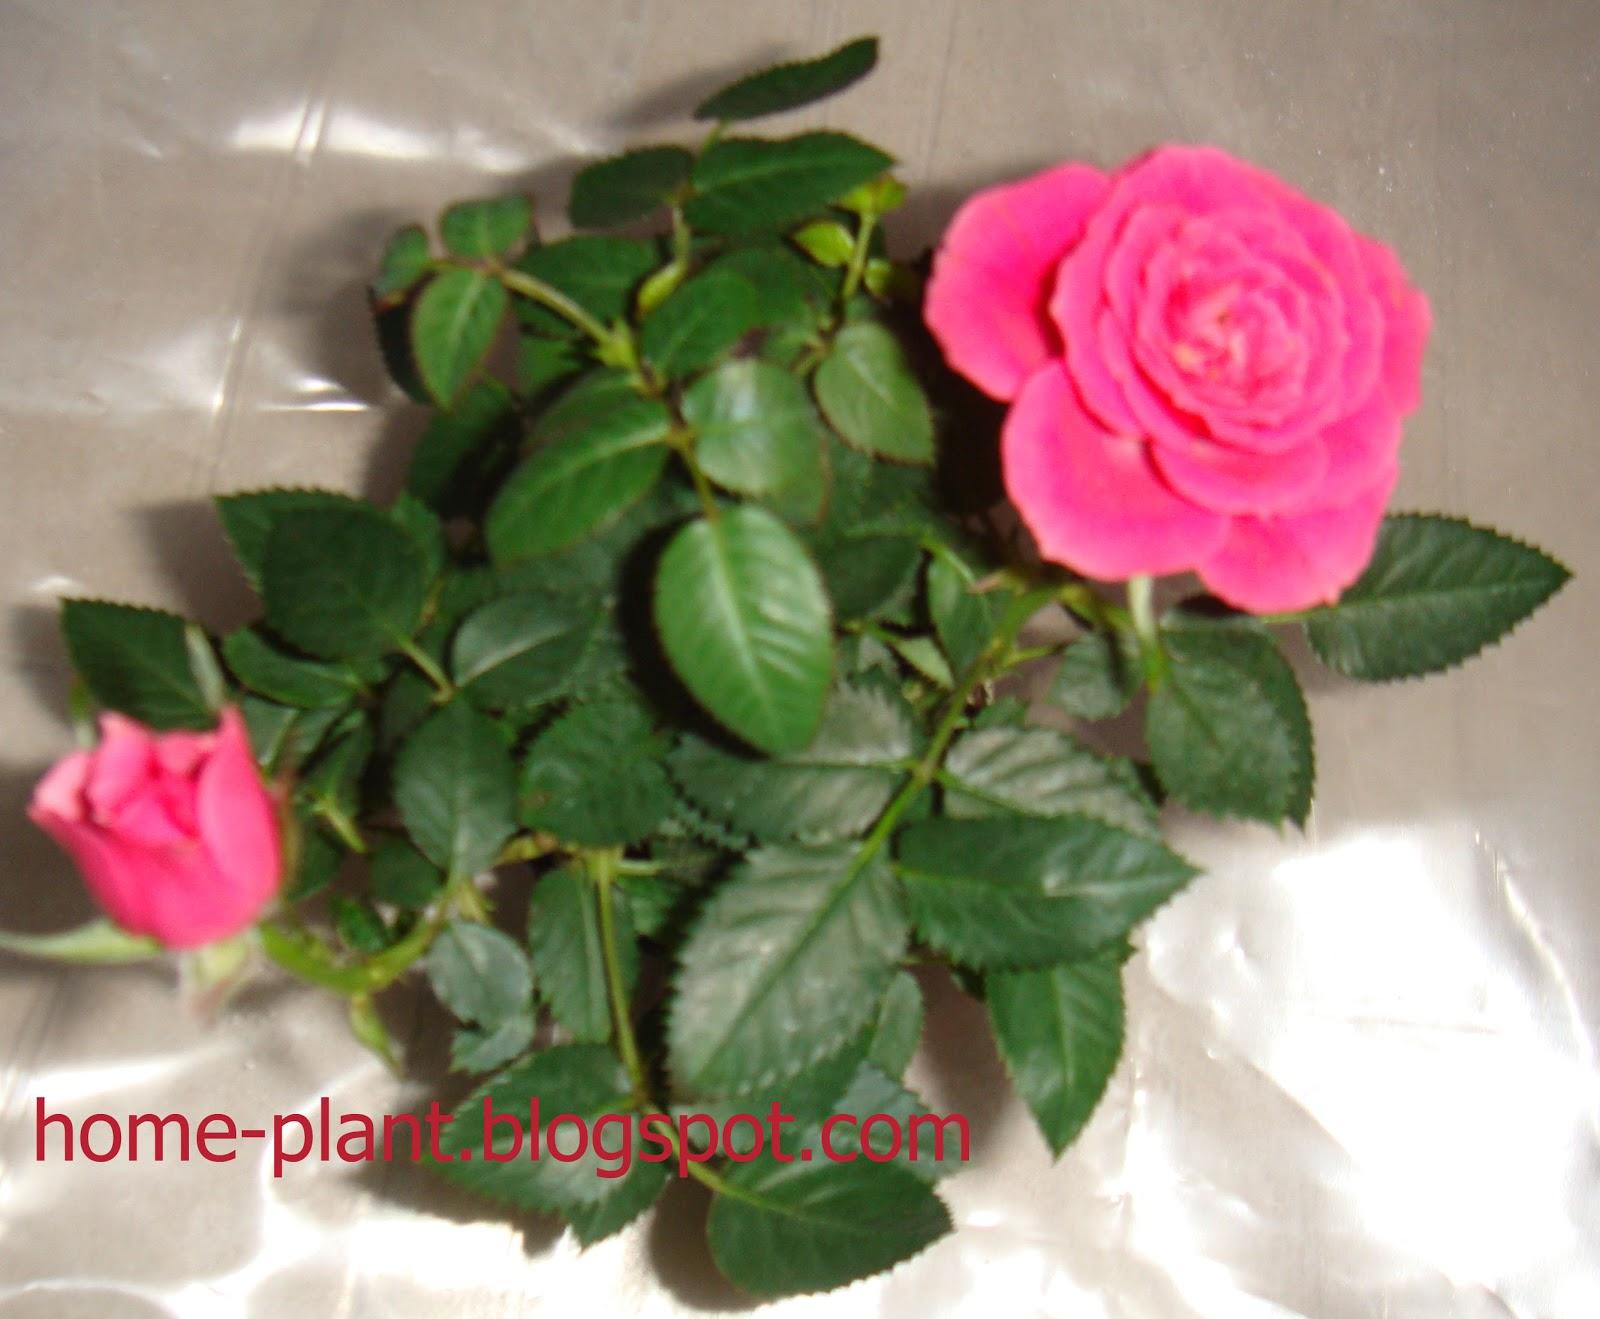 Комнатная роза уход в домашних условиях фото сохнут